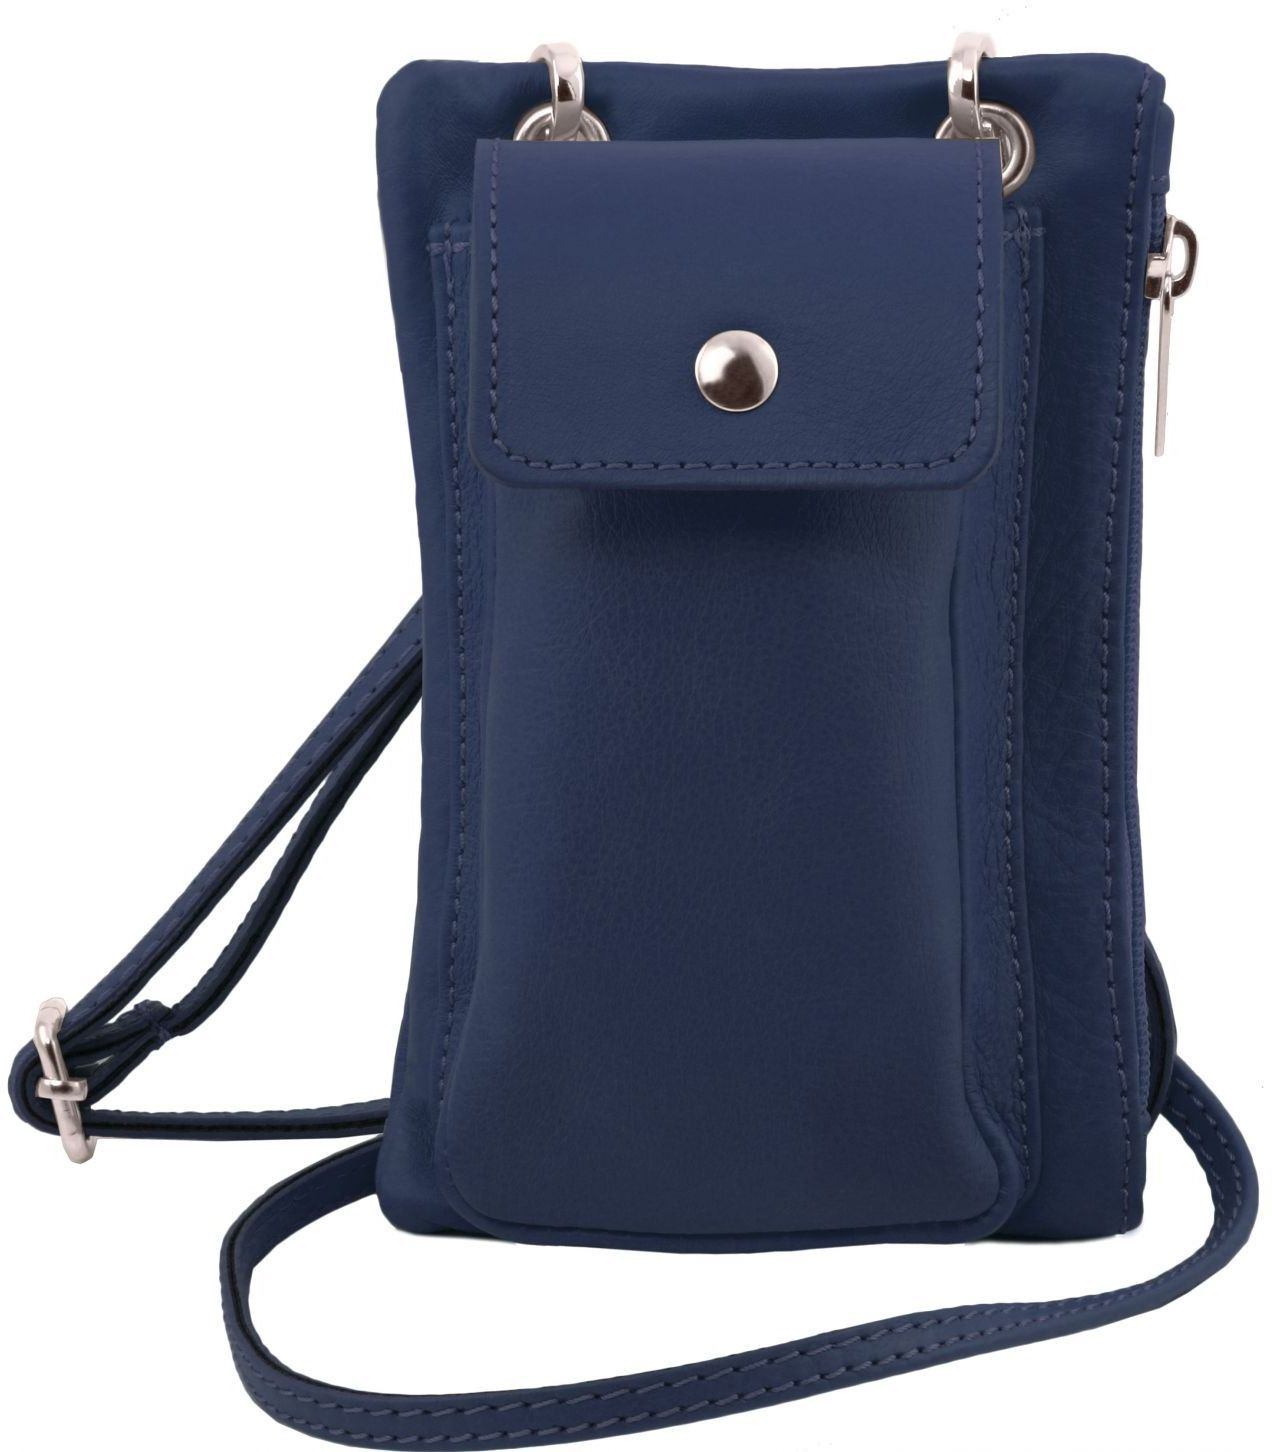 Unisex Τσαντάκι Δερμάτινο Mini Cross TL141423 Μπλε σκούρο Tuscany Leather γυναίκα   τσάντες ώμου   χειρός